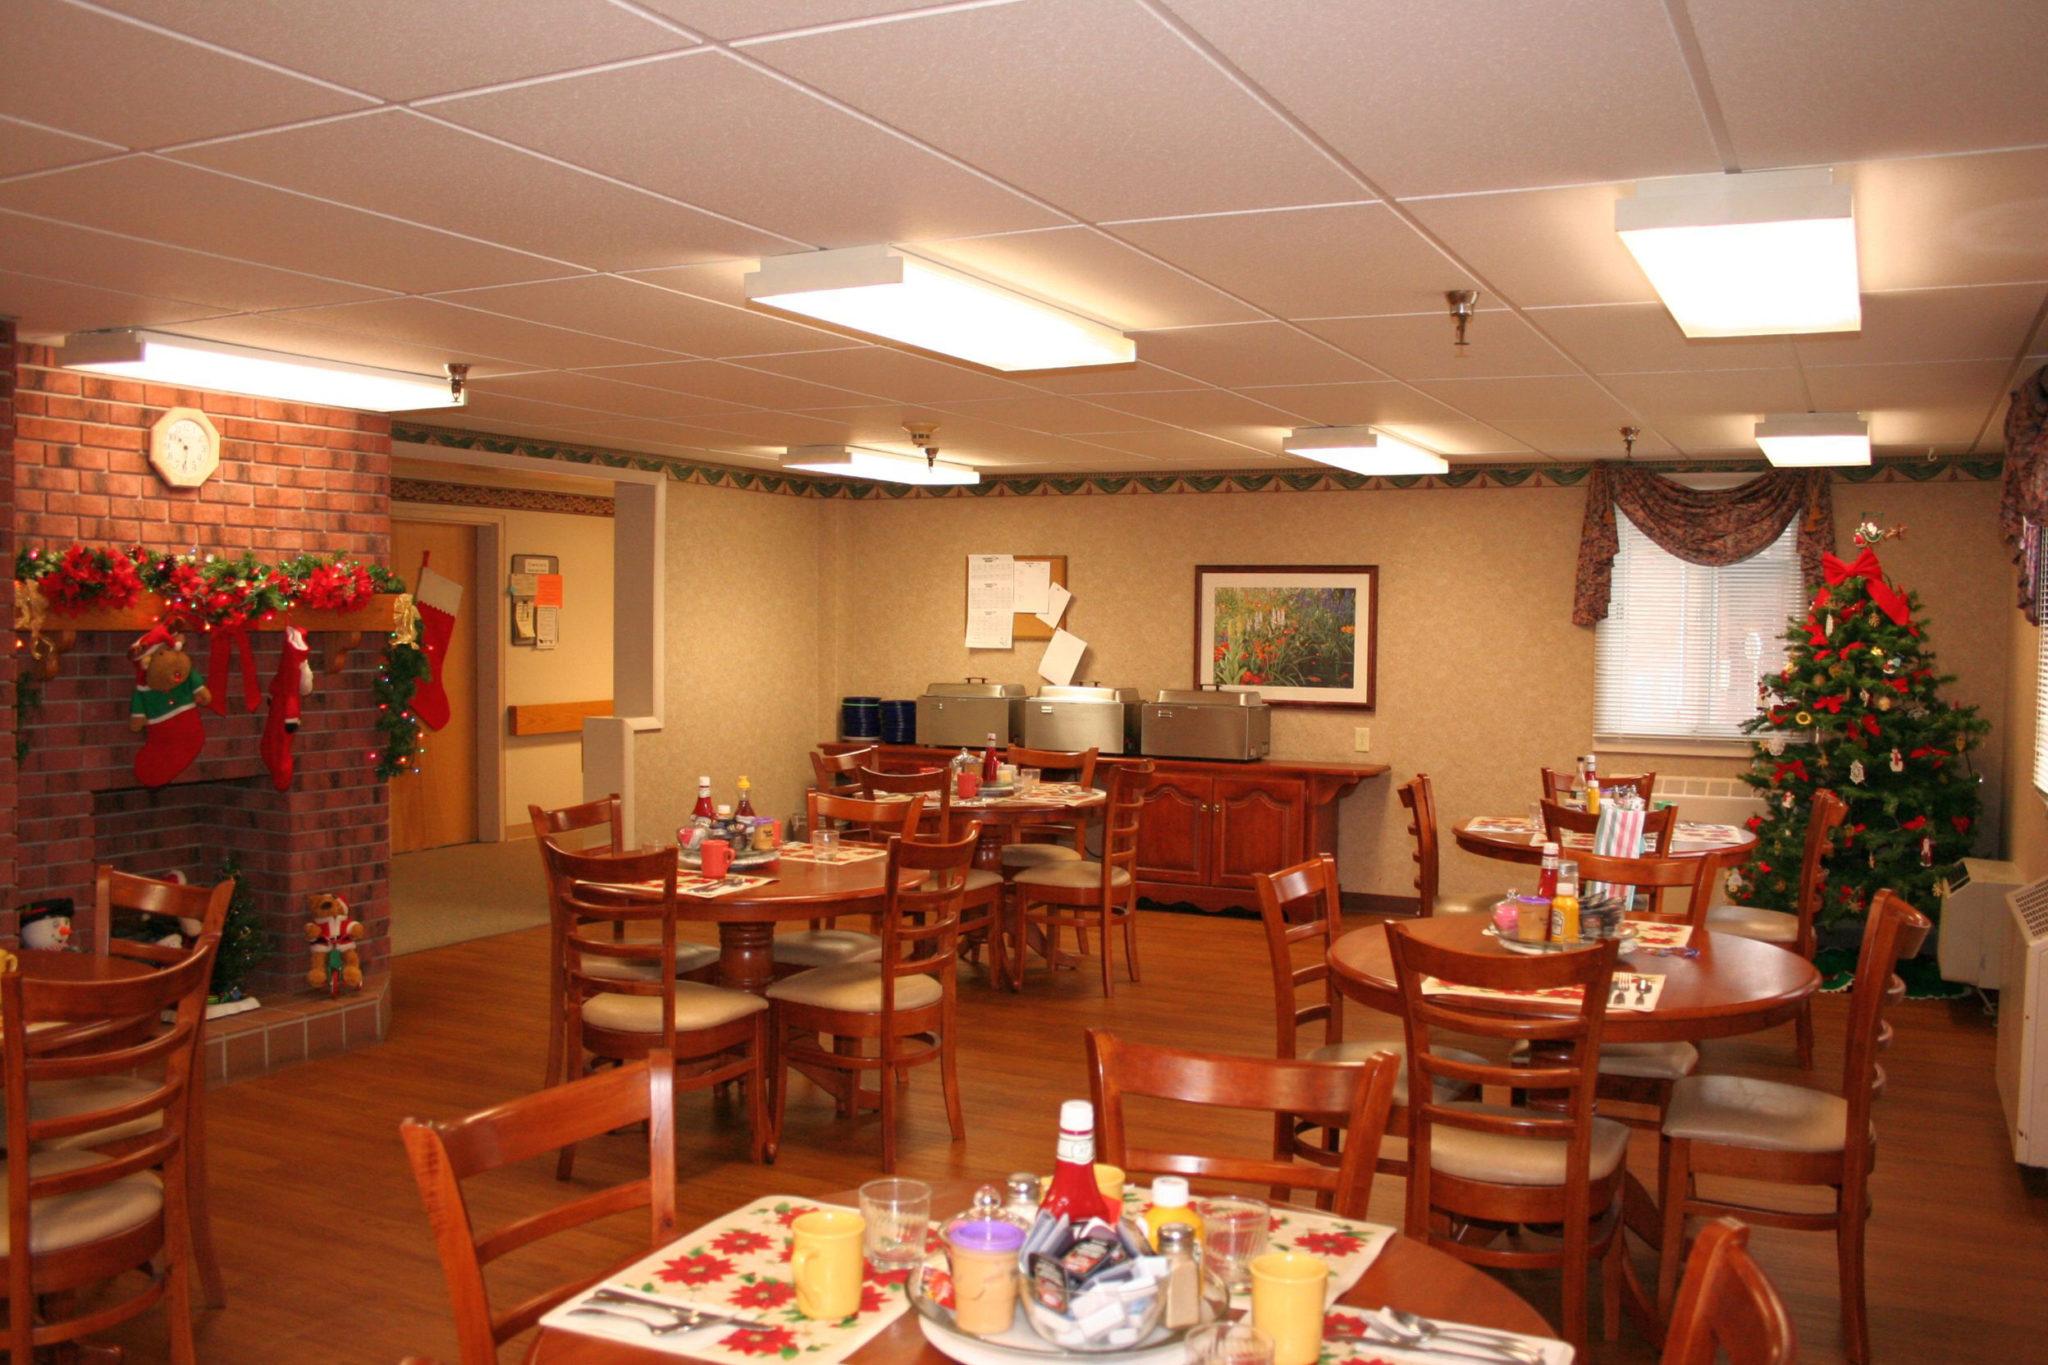 Oil City Health Care, Rehabilitation Center, and Senior Living - 1293 Grandview Road Oil City, PA 16301